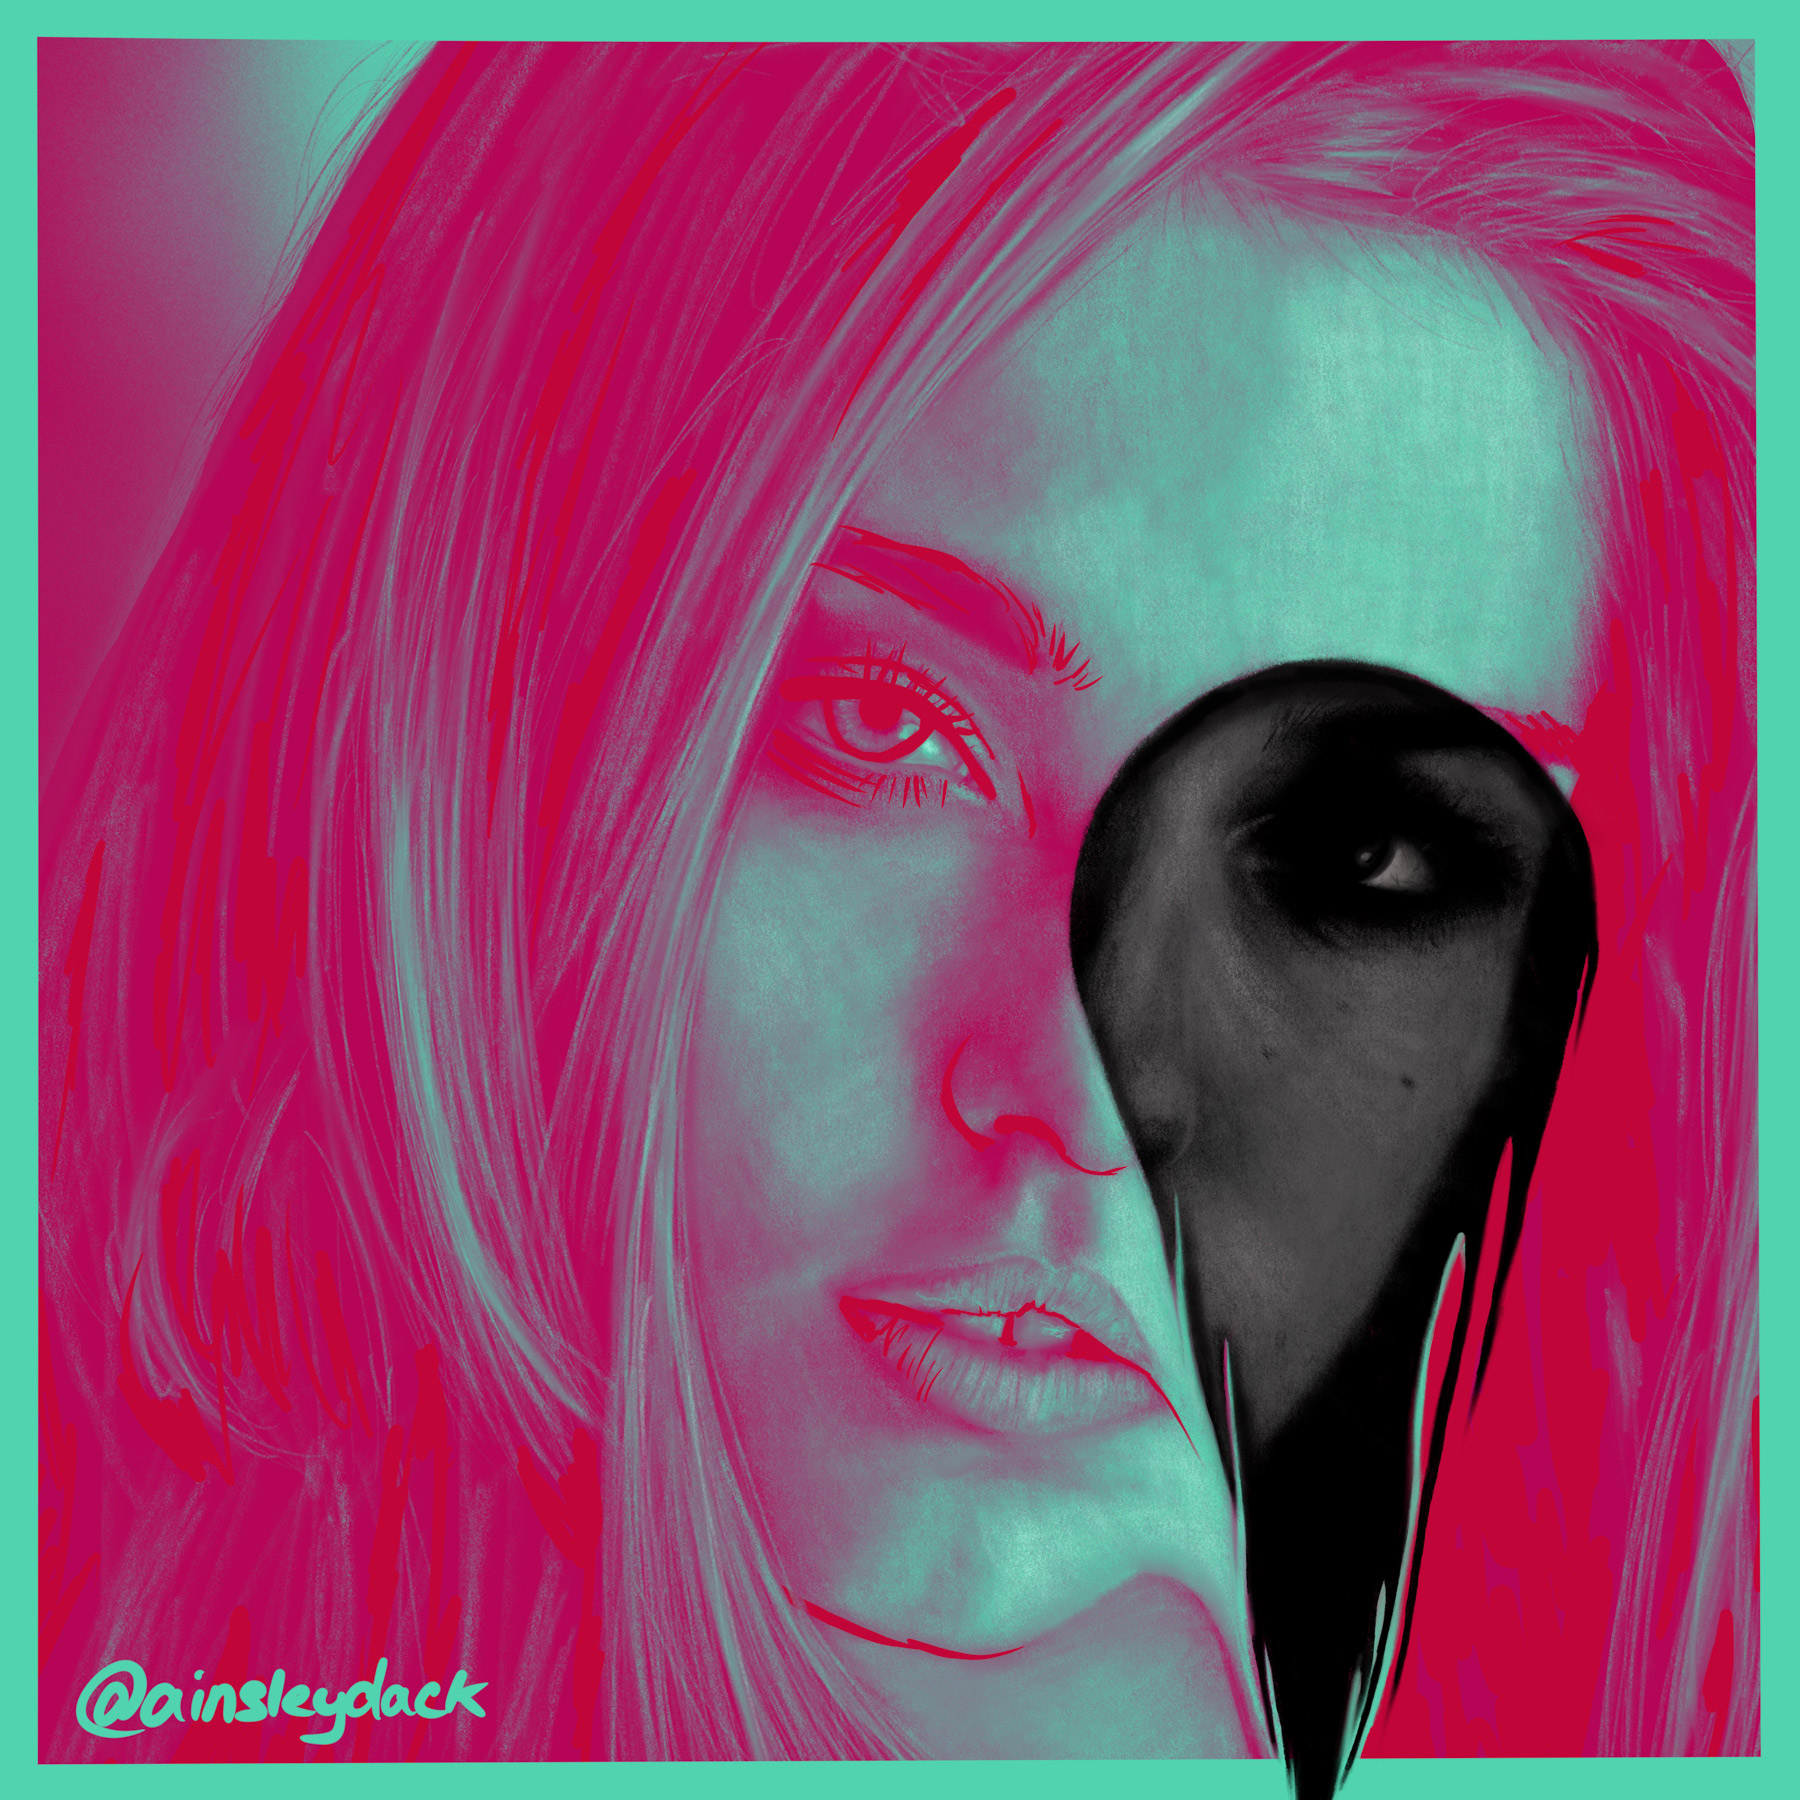 Ainsley-Dack---Scorching.jpg